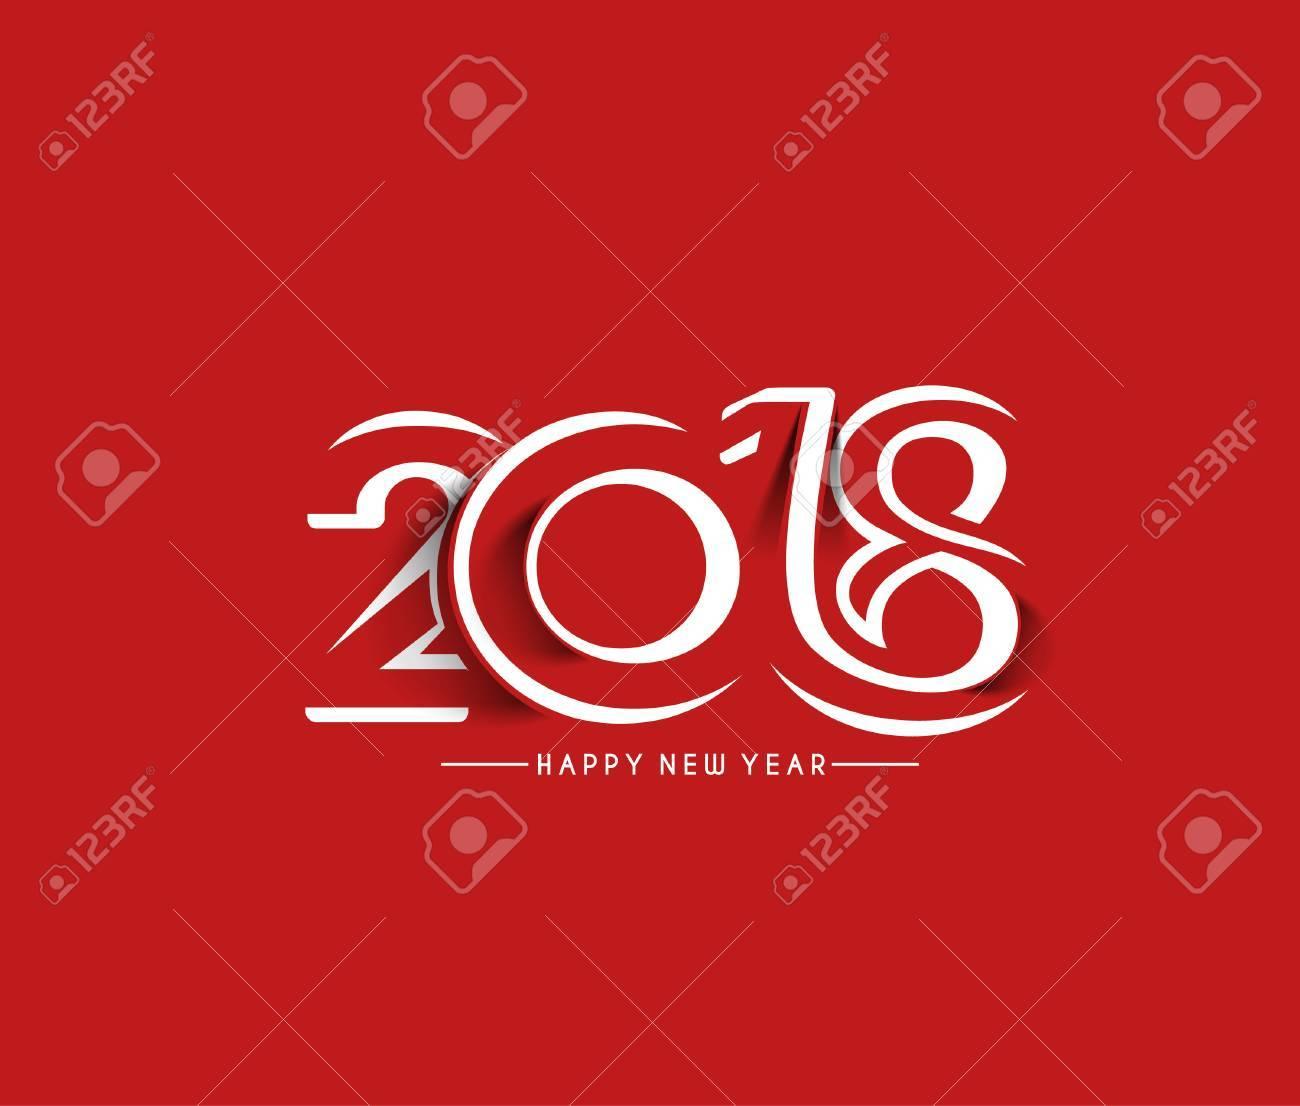 Happy new year 2018 Text Design, Vector illustration. - 89472598